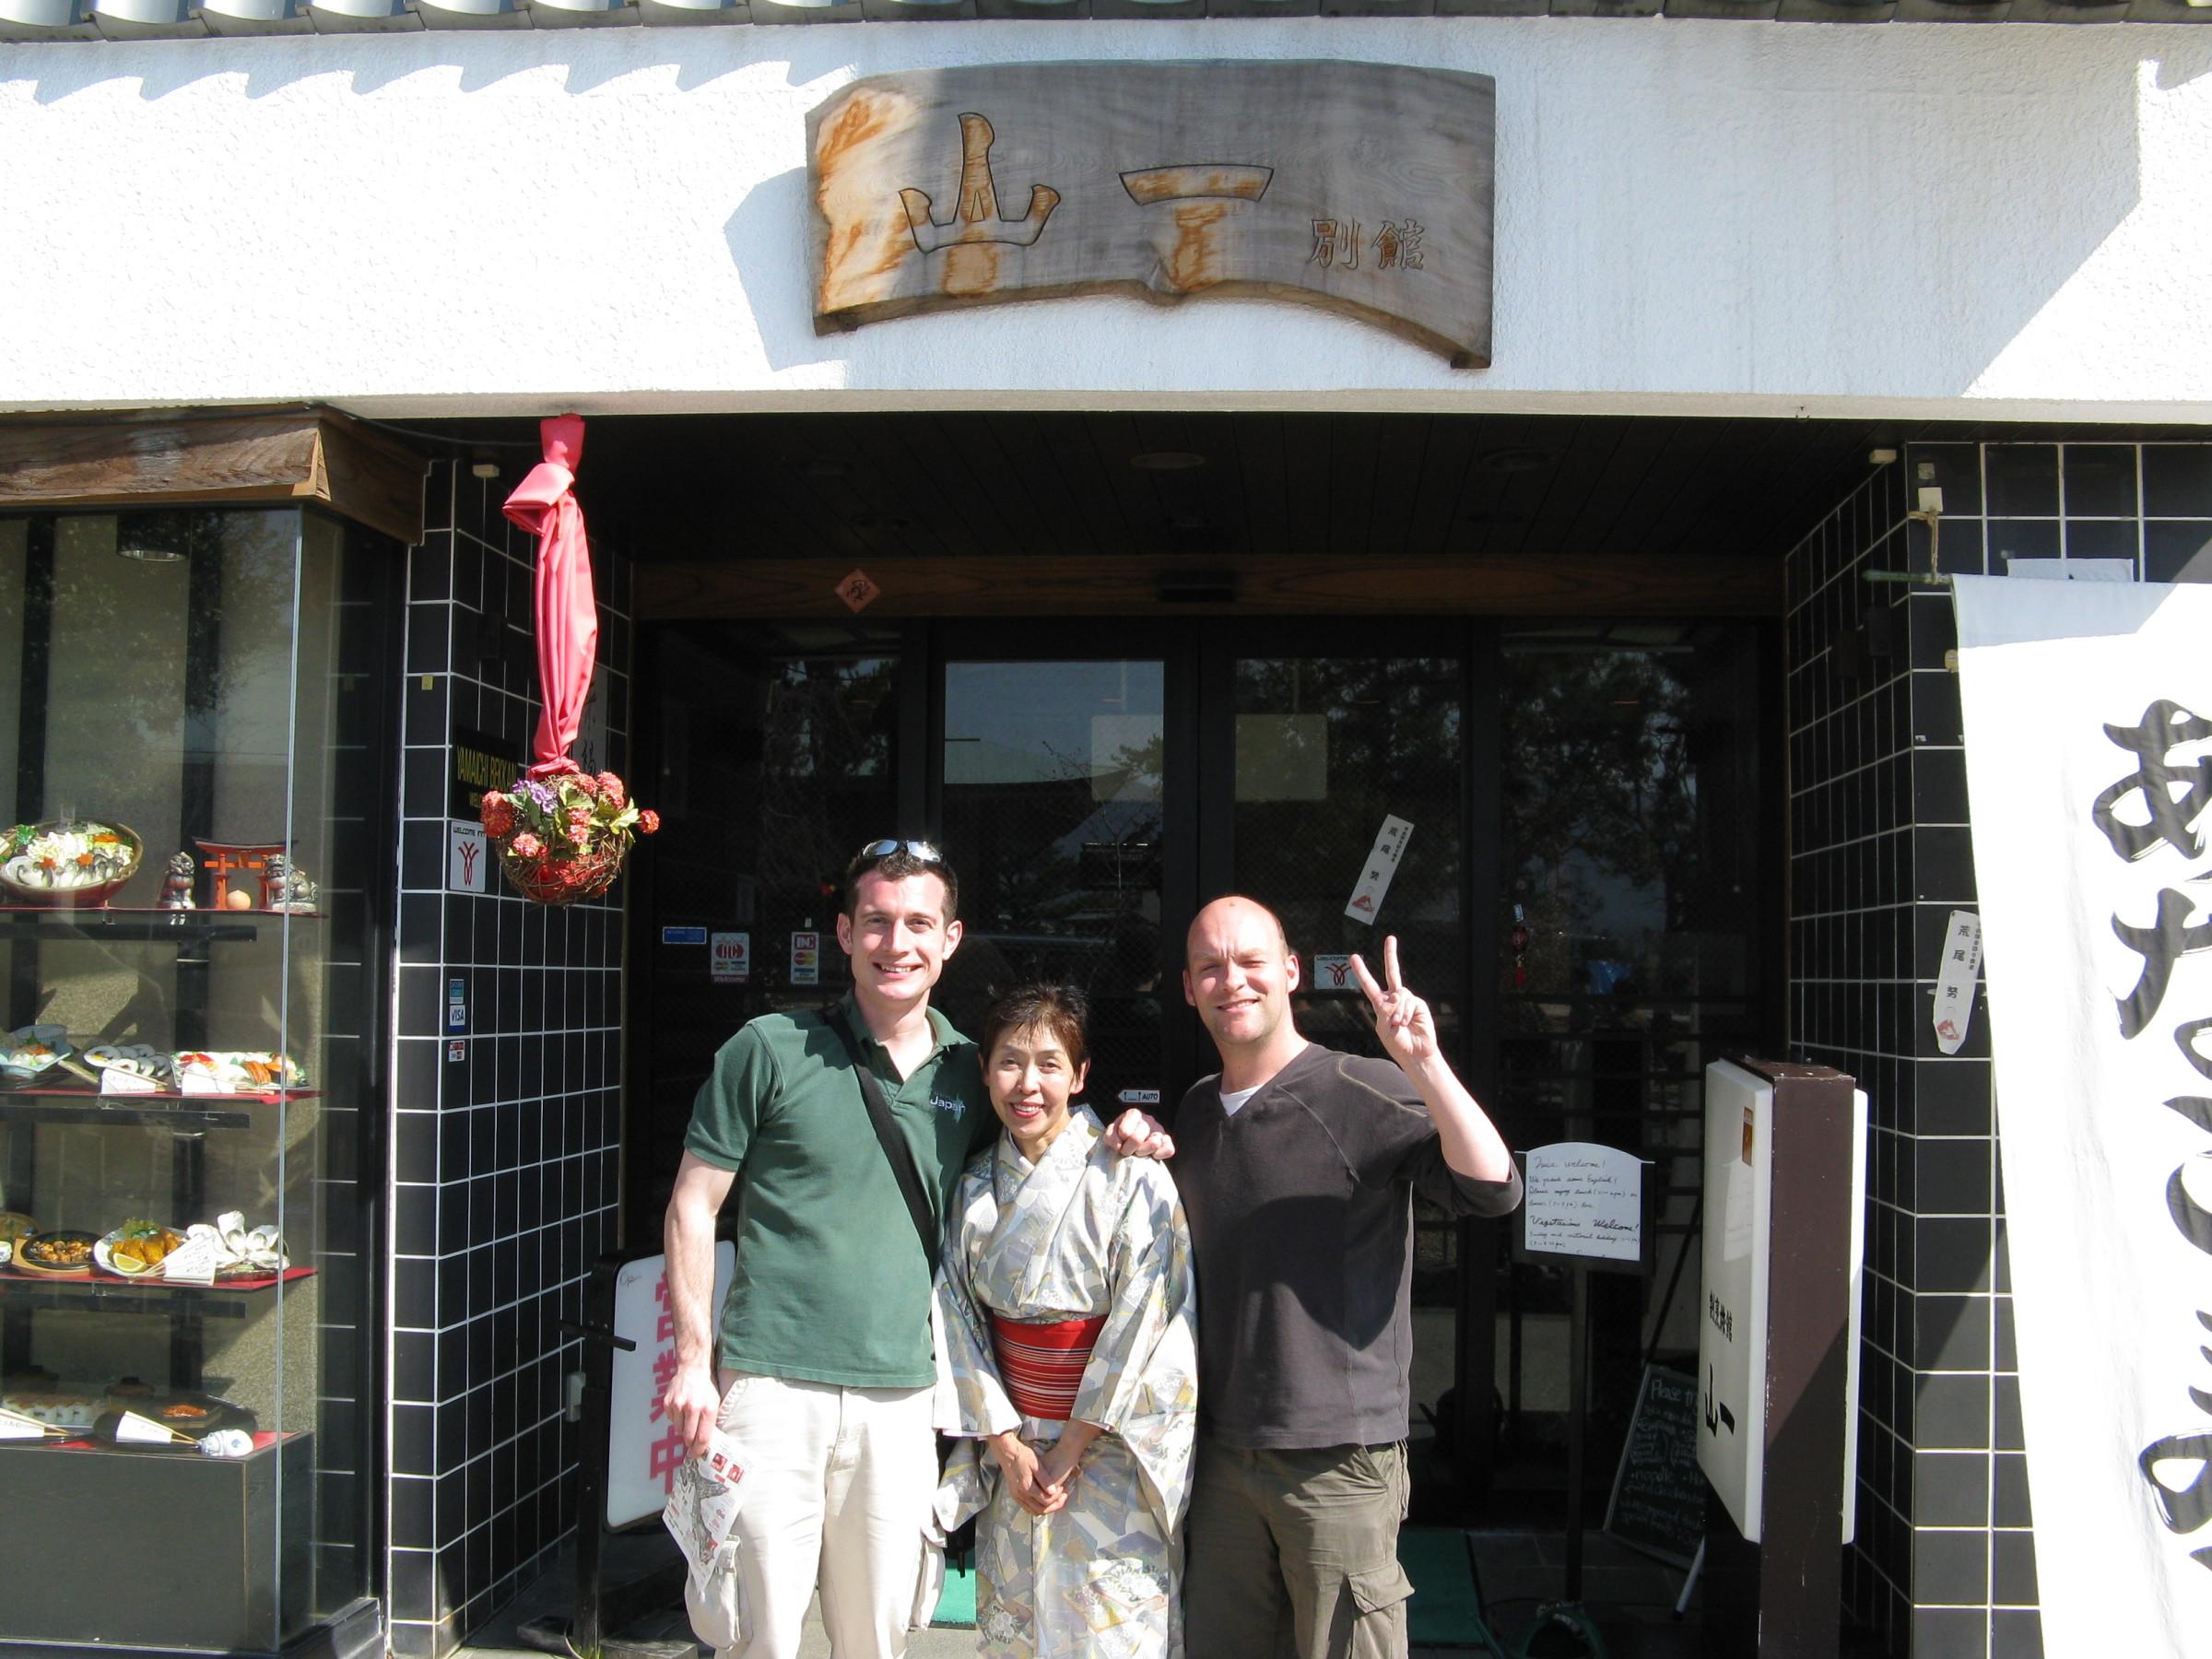 InsideJapan's Harry and James with Yamaichi Bekkan's proprietress